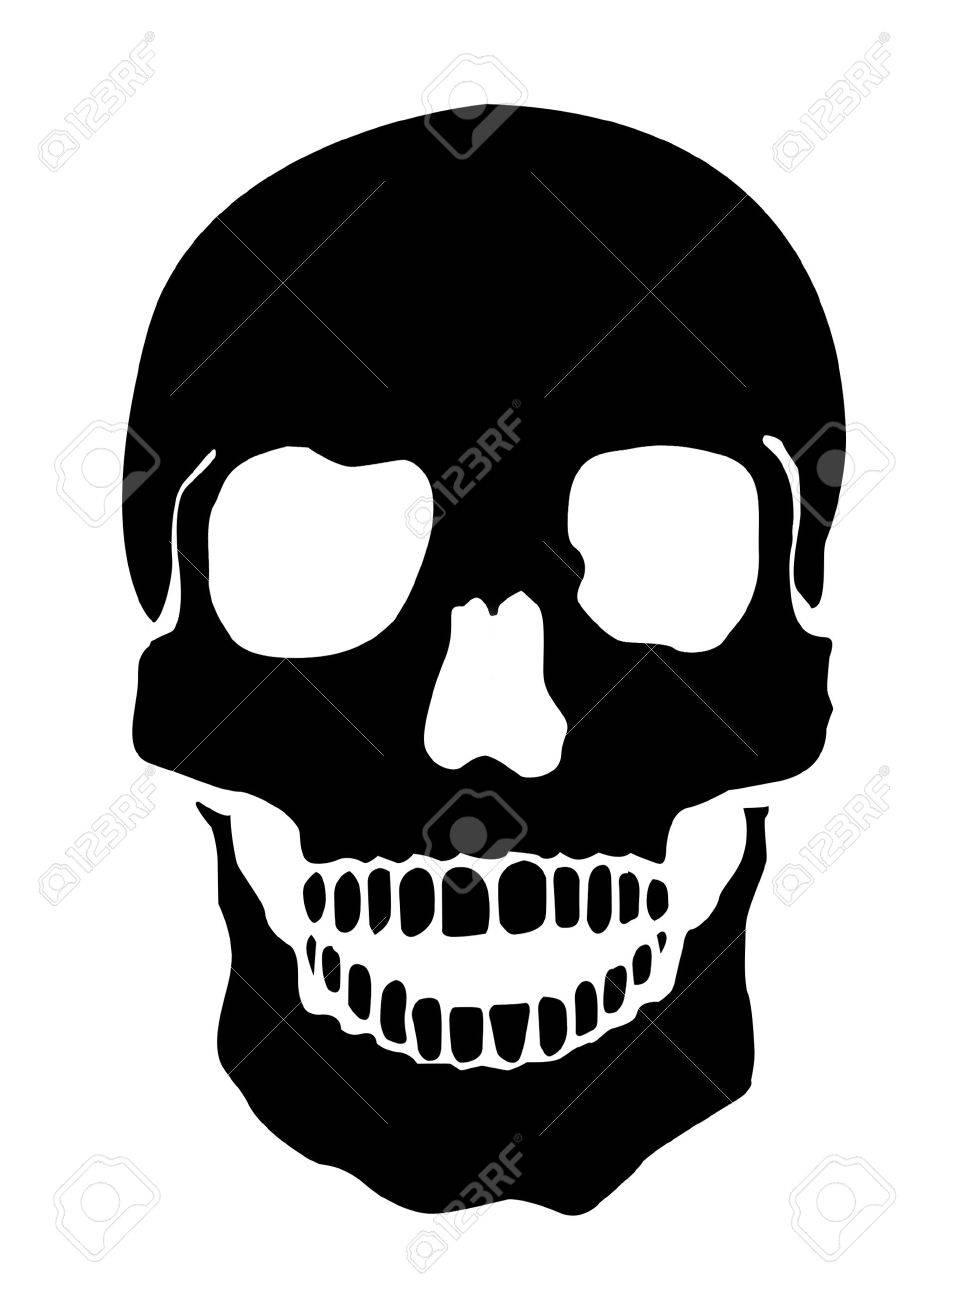 Simple Illustration Of A Human Skull, White Background Stock Illustration - 2517026